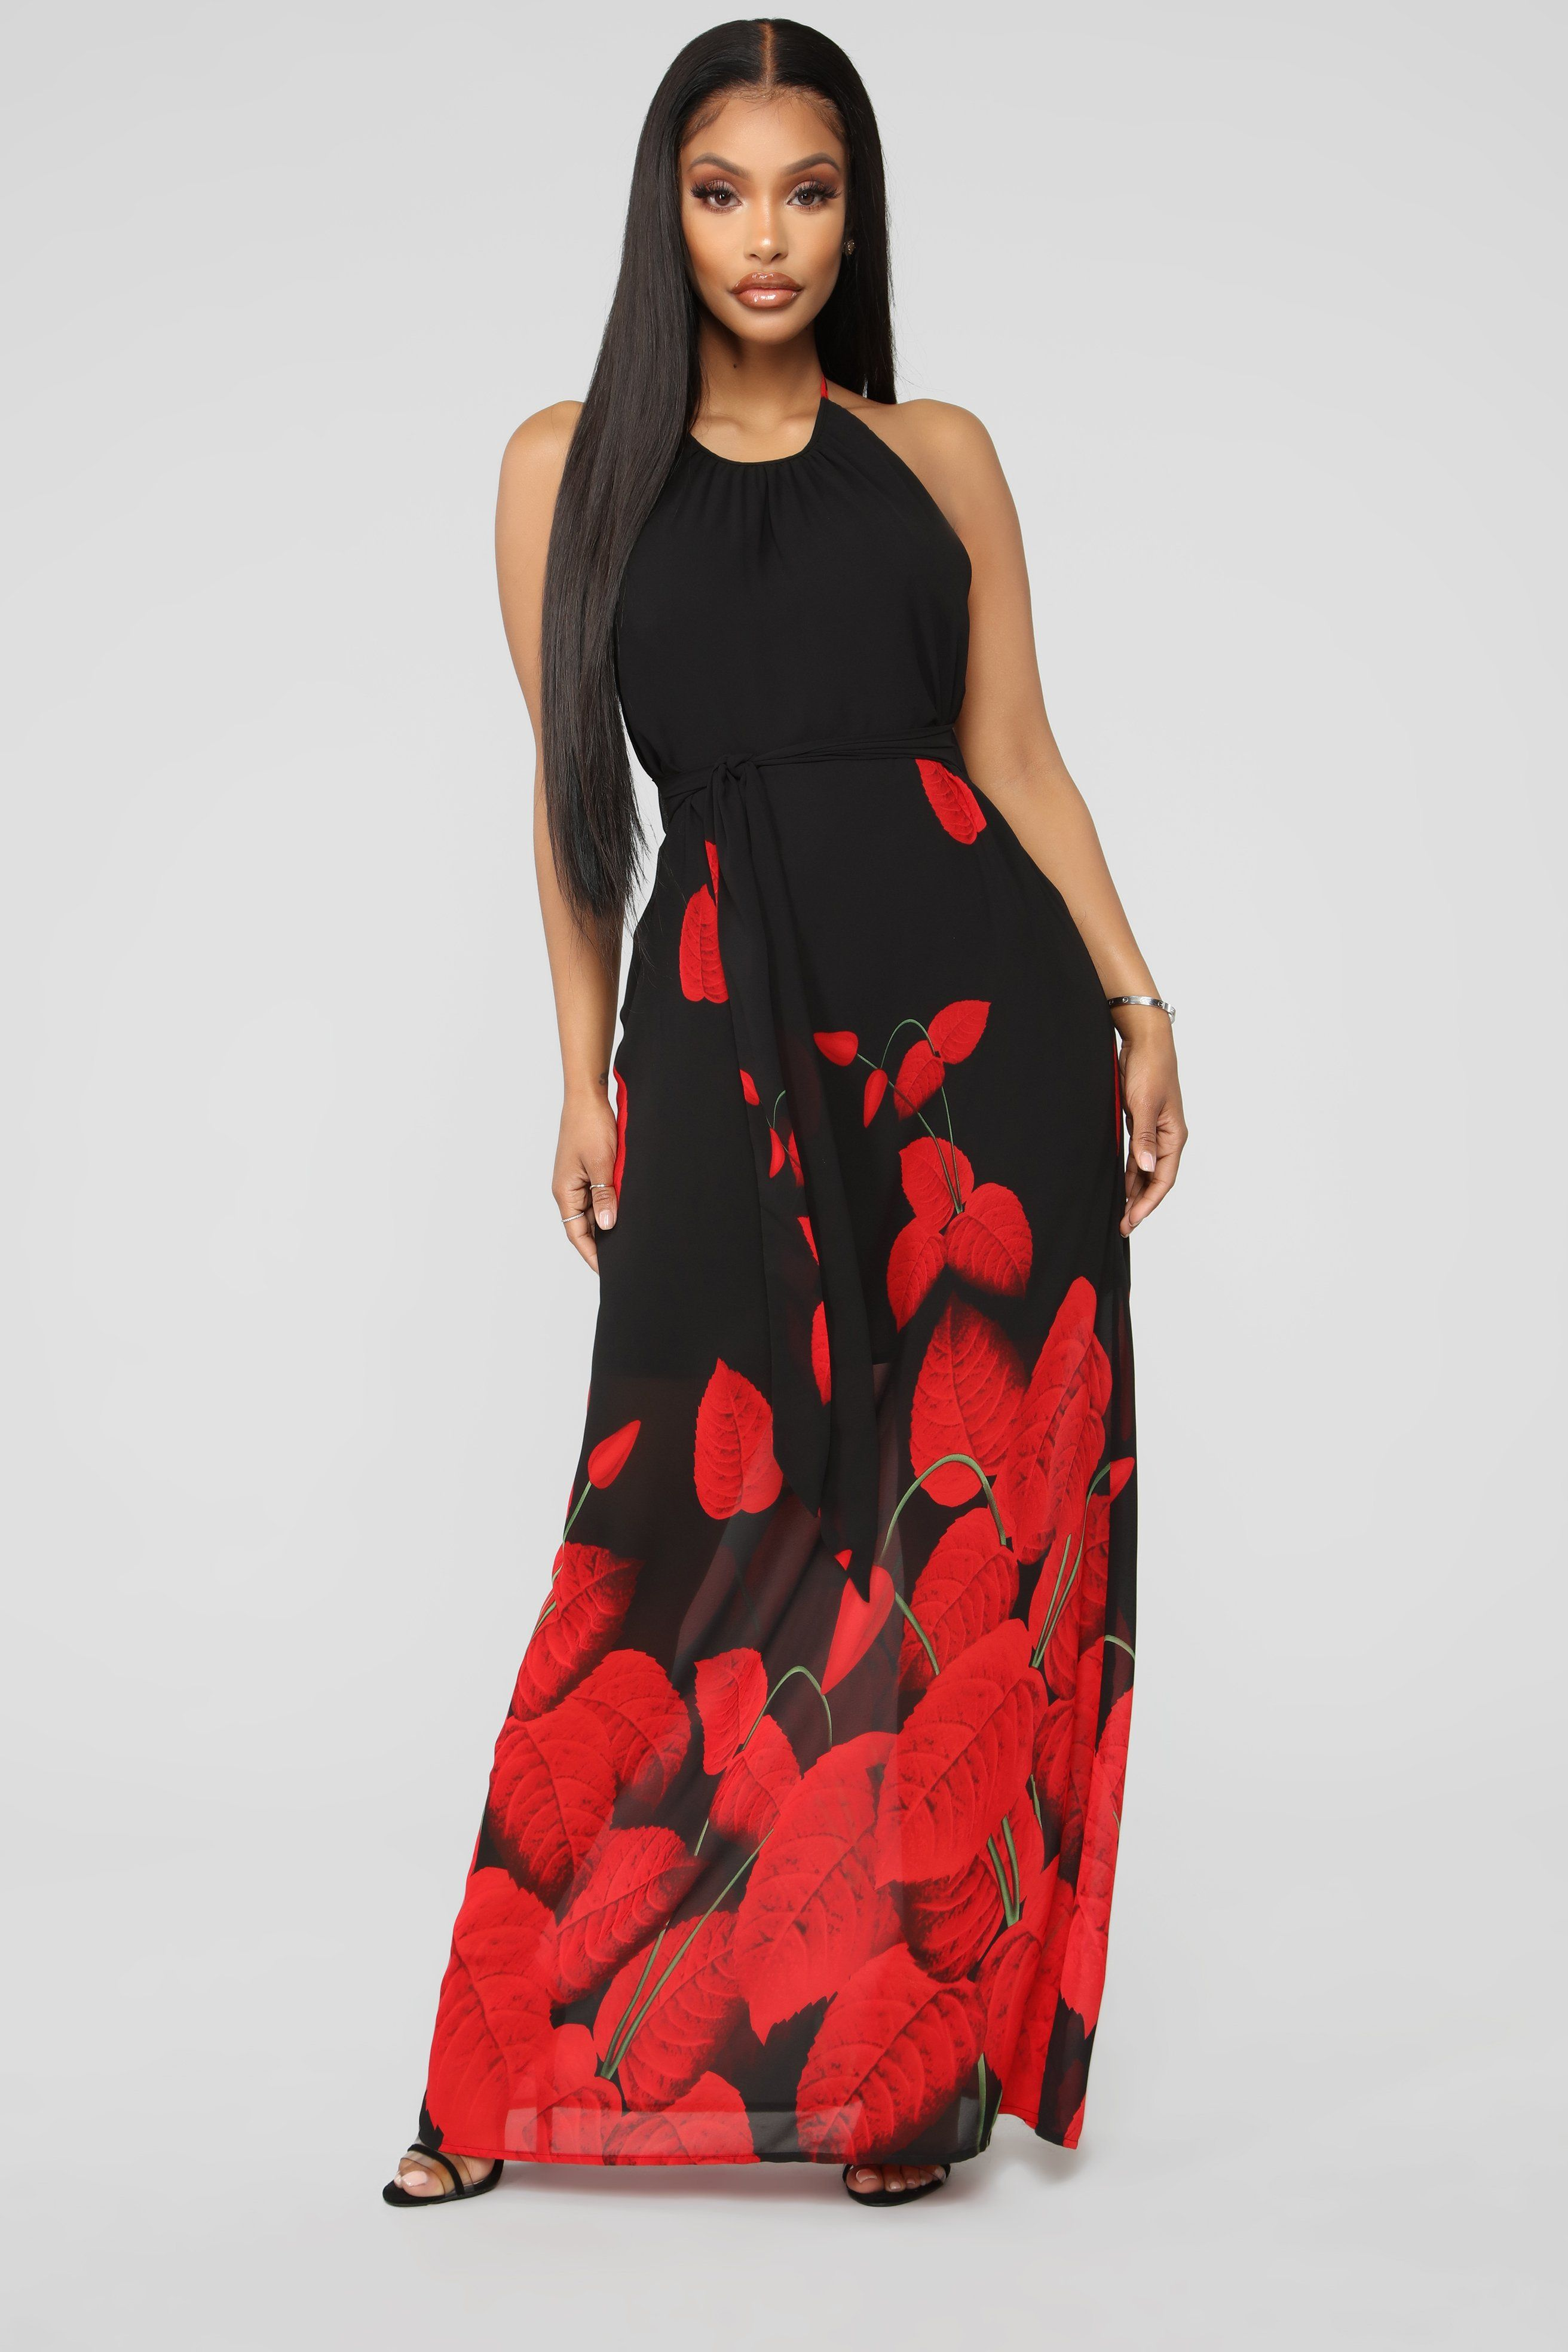 39276548f1 Simple Black Halter Maxi Dress   Dresses   Halter maxi dresses, Dresses,  Black maxi